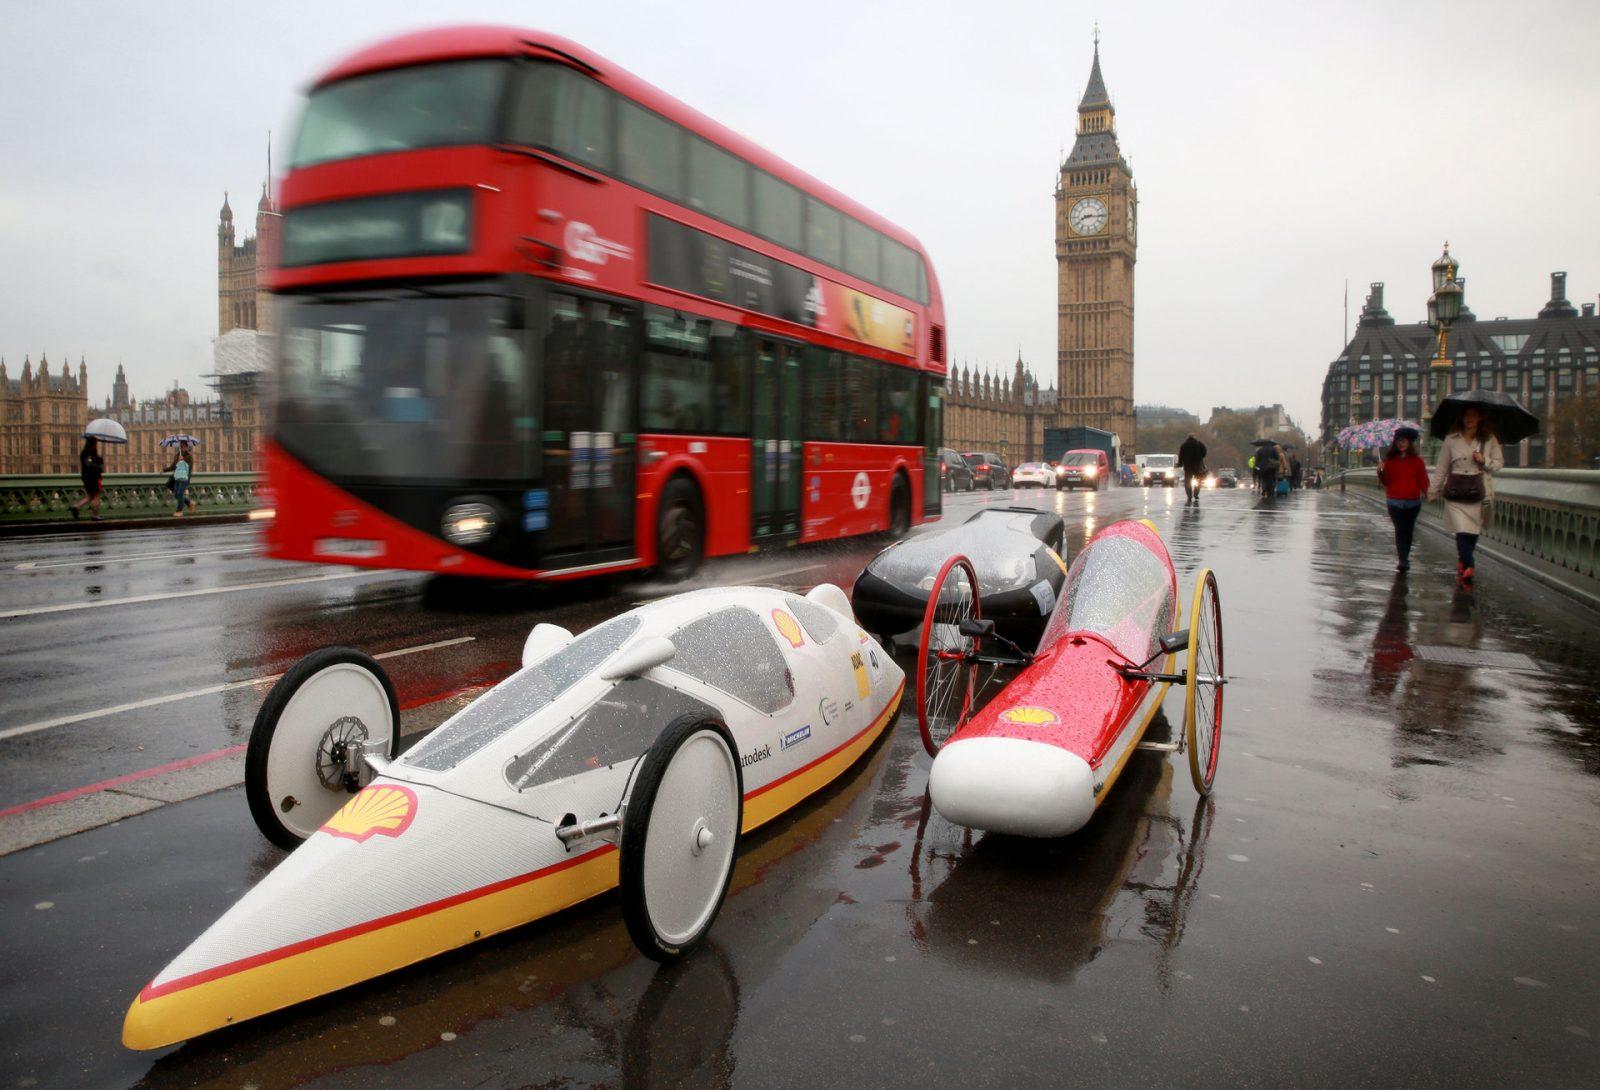 shell-eco-marathon-London-westminster-big-ben